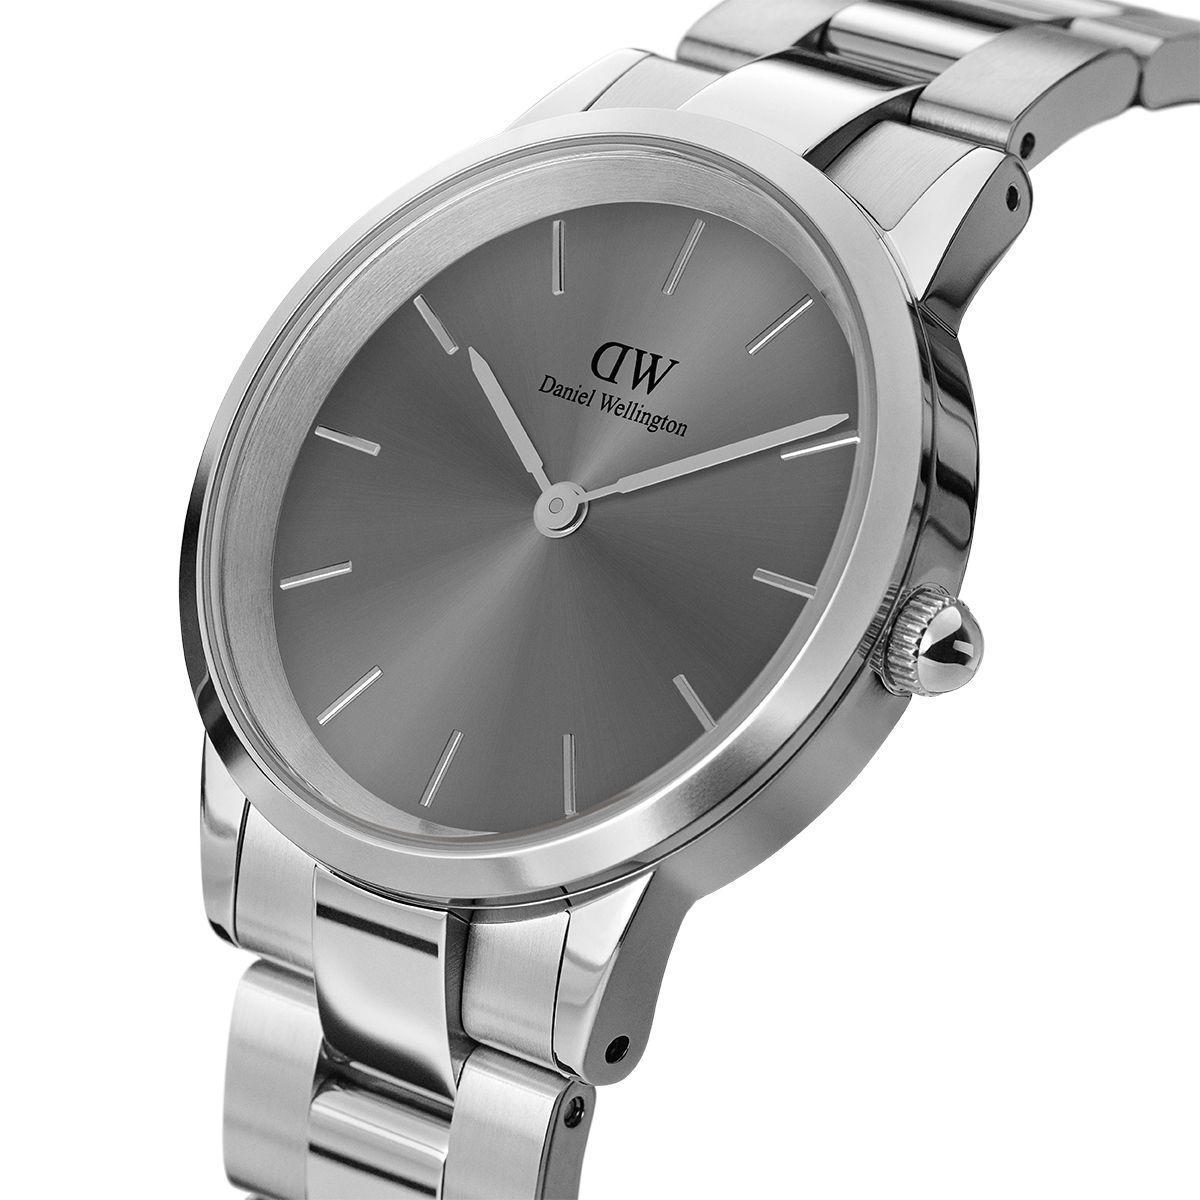 dw官网 dw手表官网 dw中国官网 dw官方旗舰店 DW DW官网  Watch Iconic Link Silver Grey 32mm